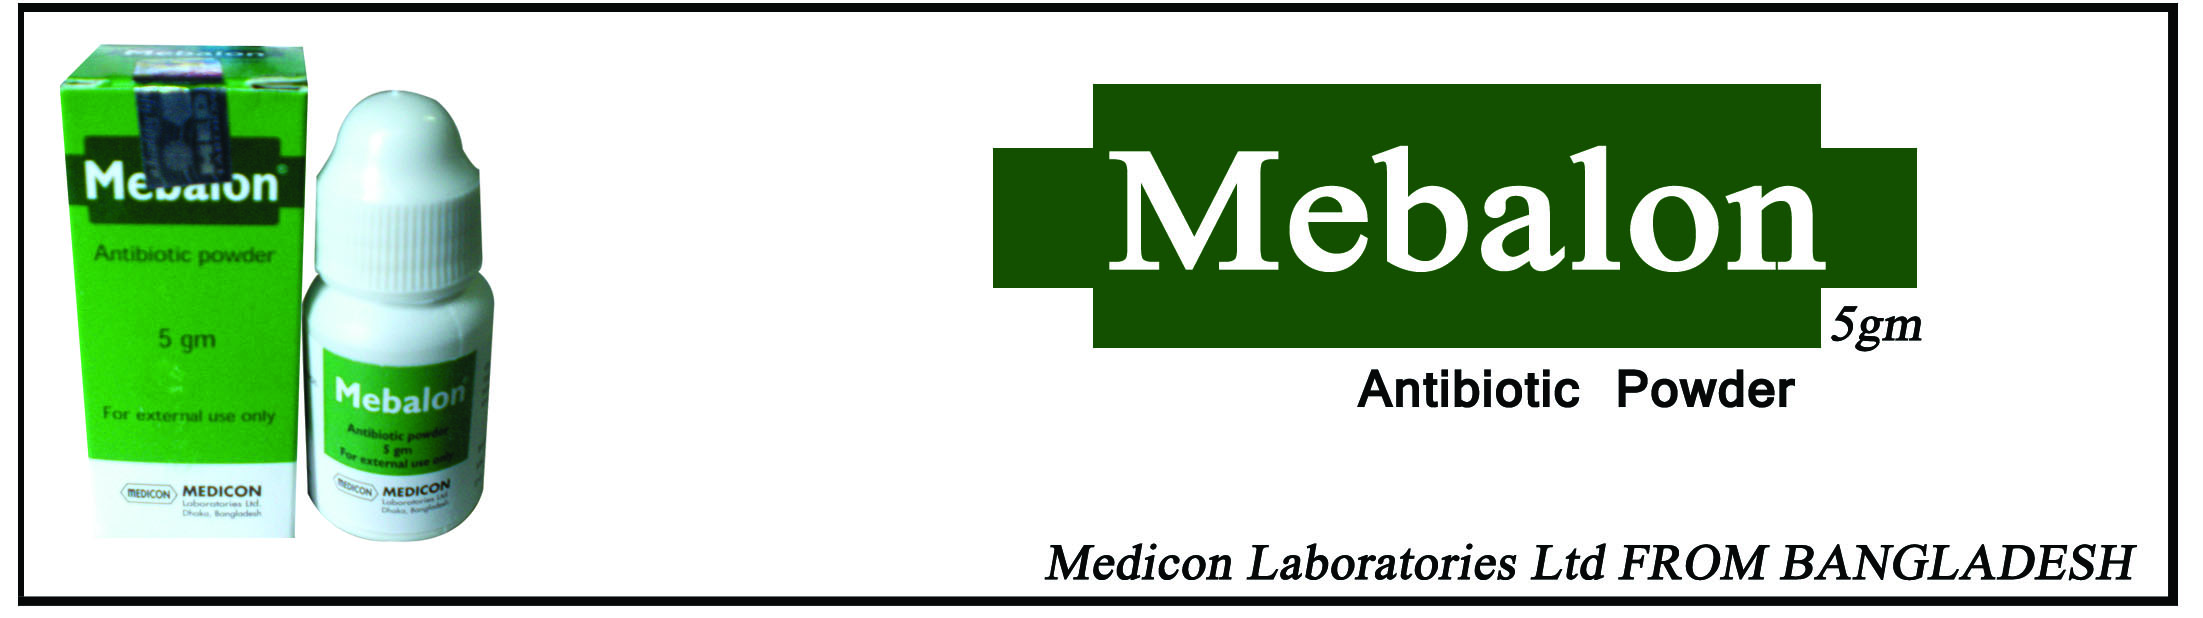 Mebalon